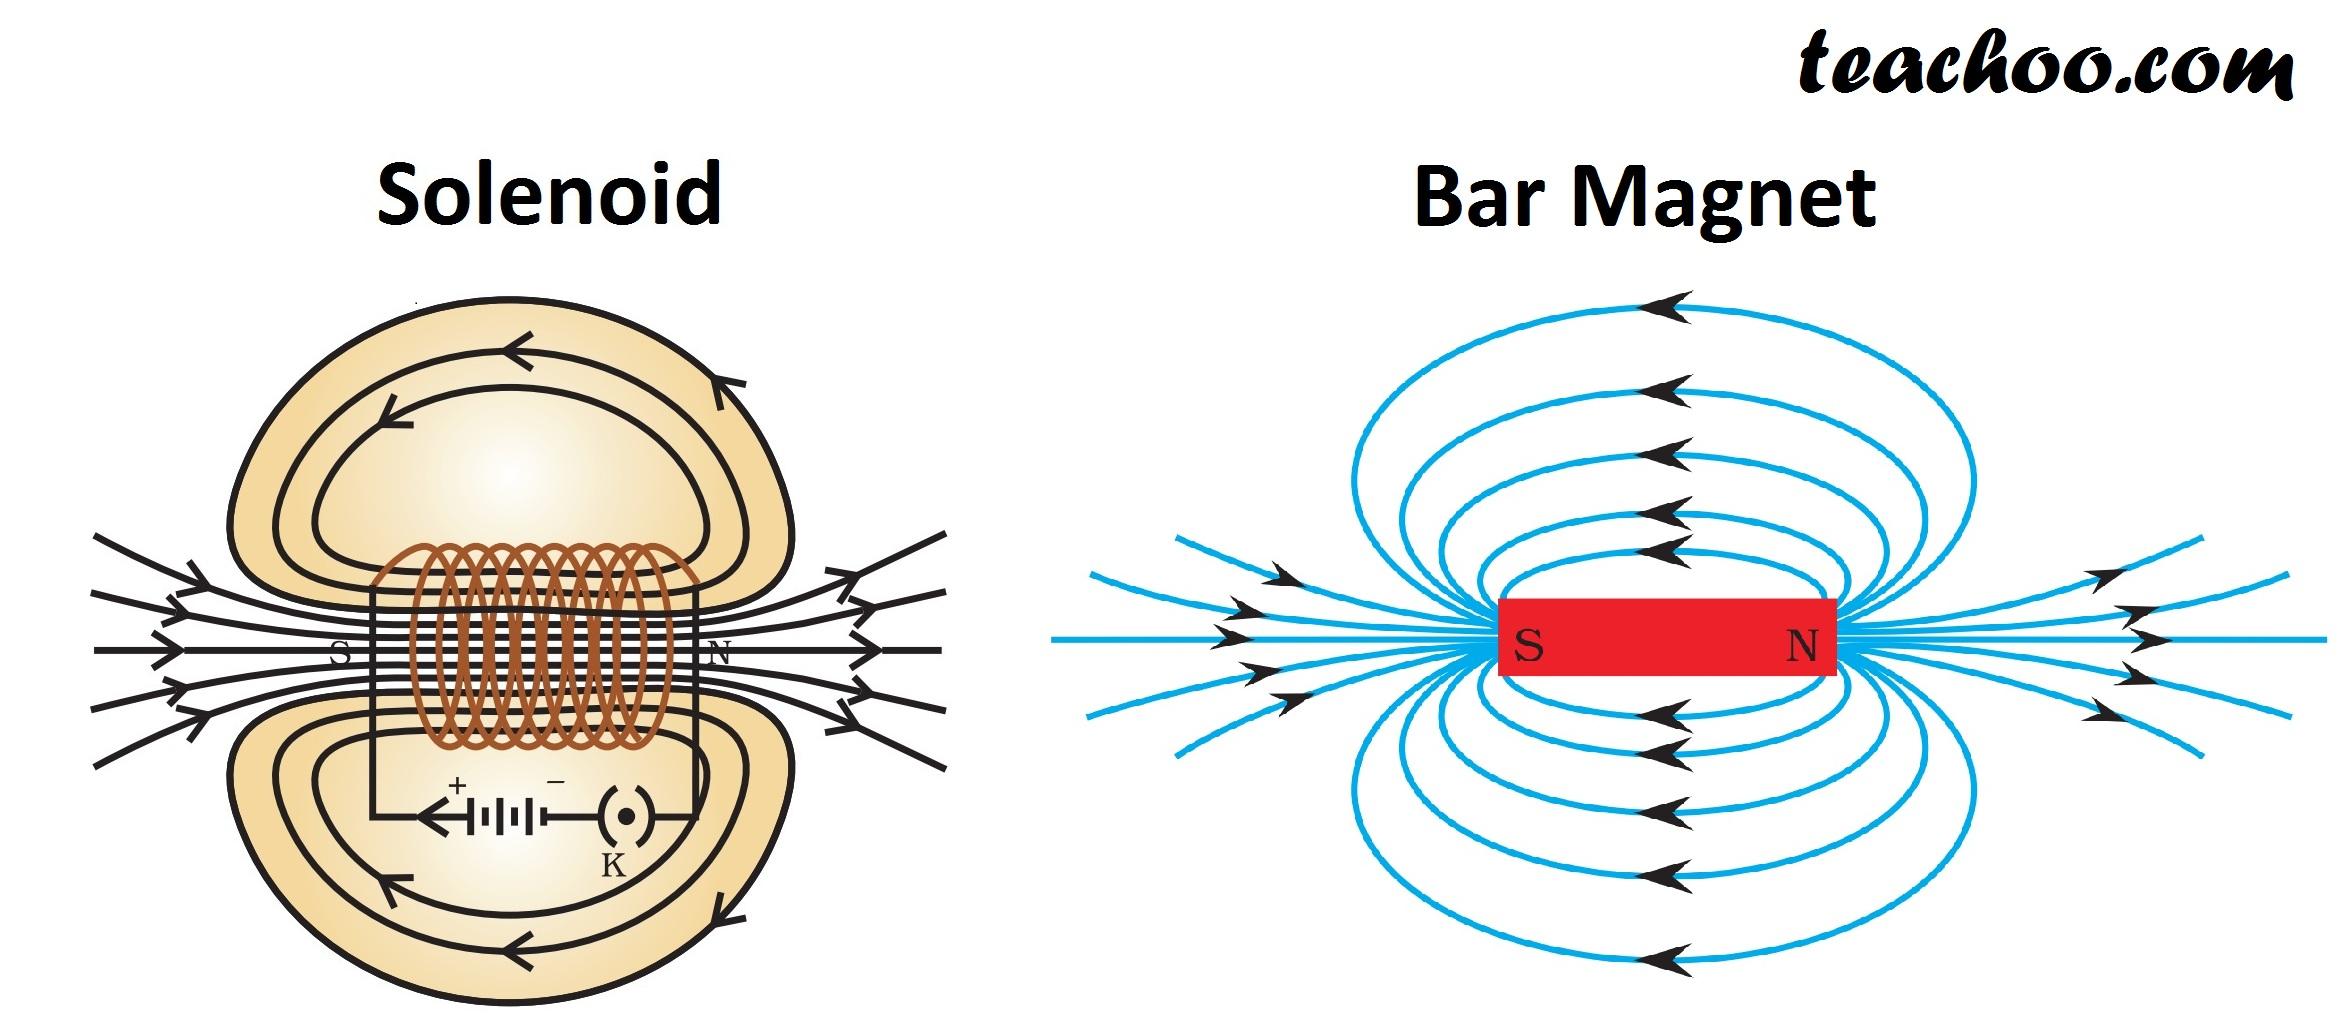 Solenoid and Bar Magnet Similarity - Teachoo.jpg